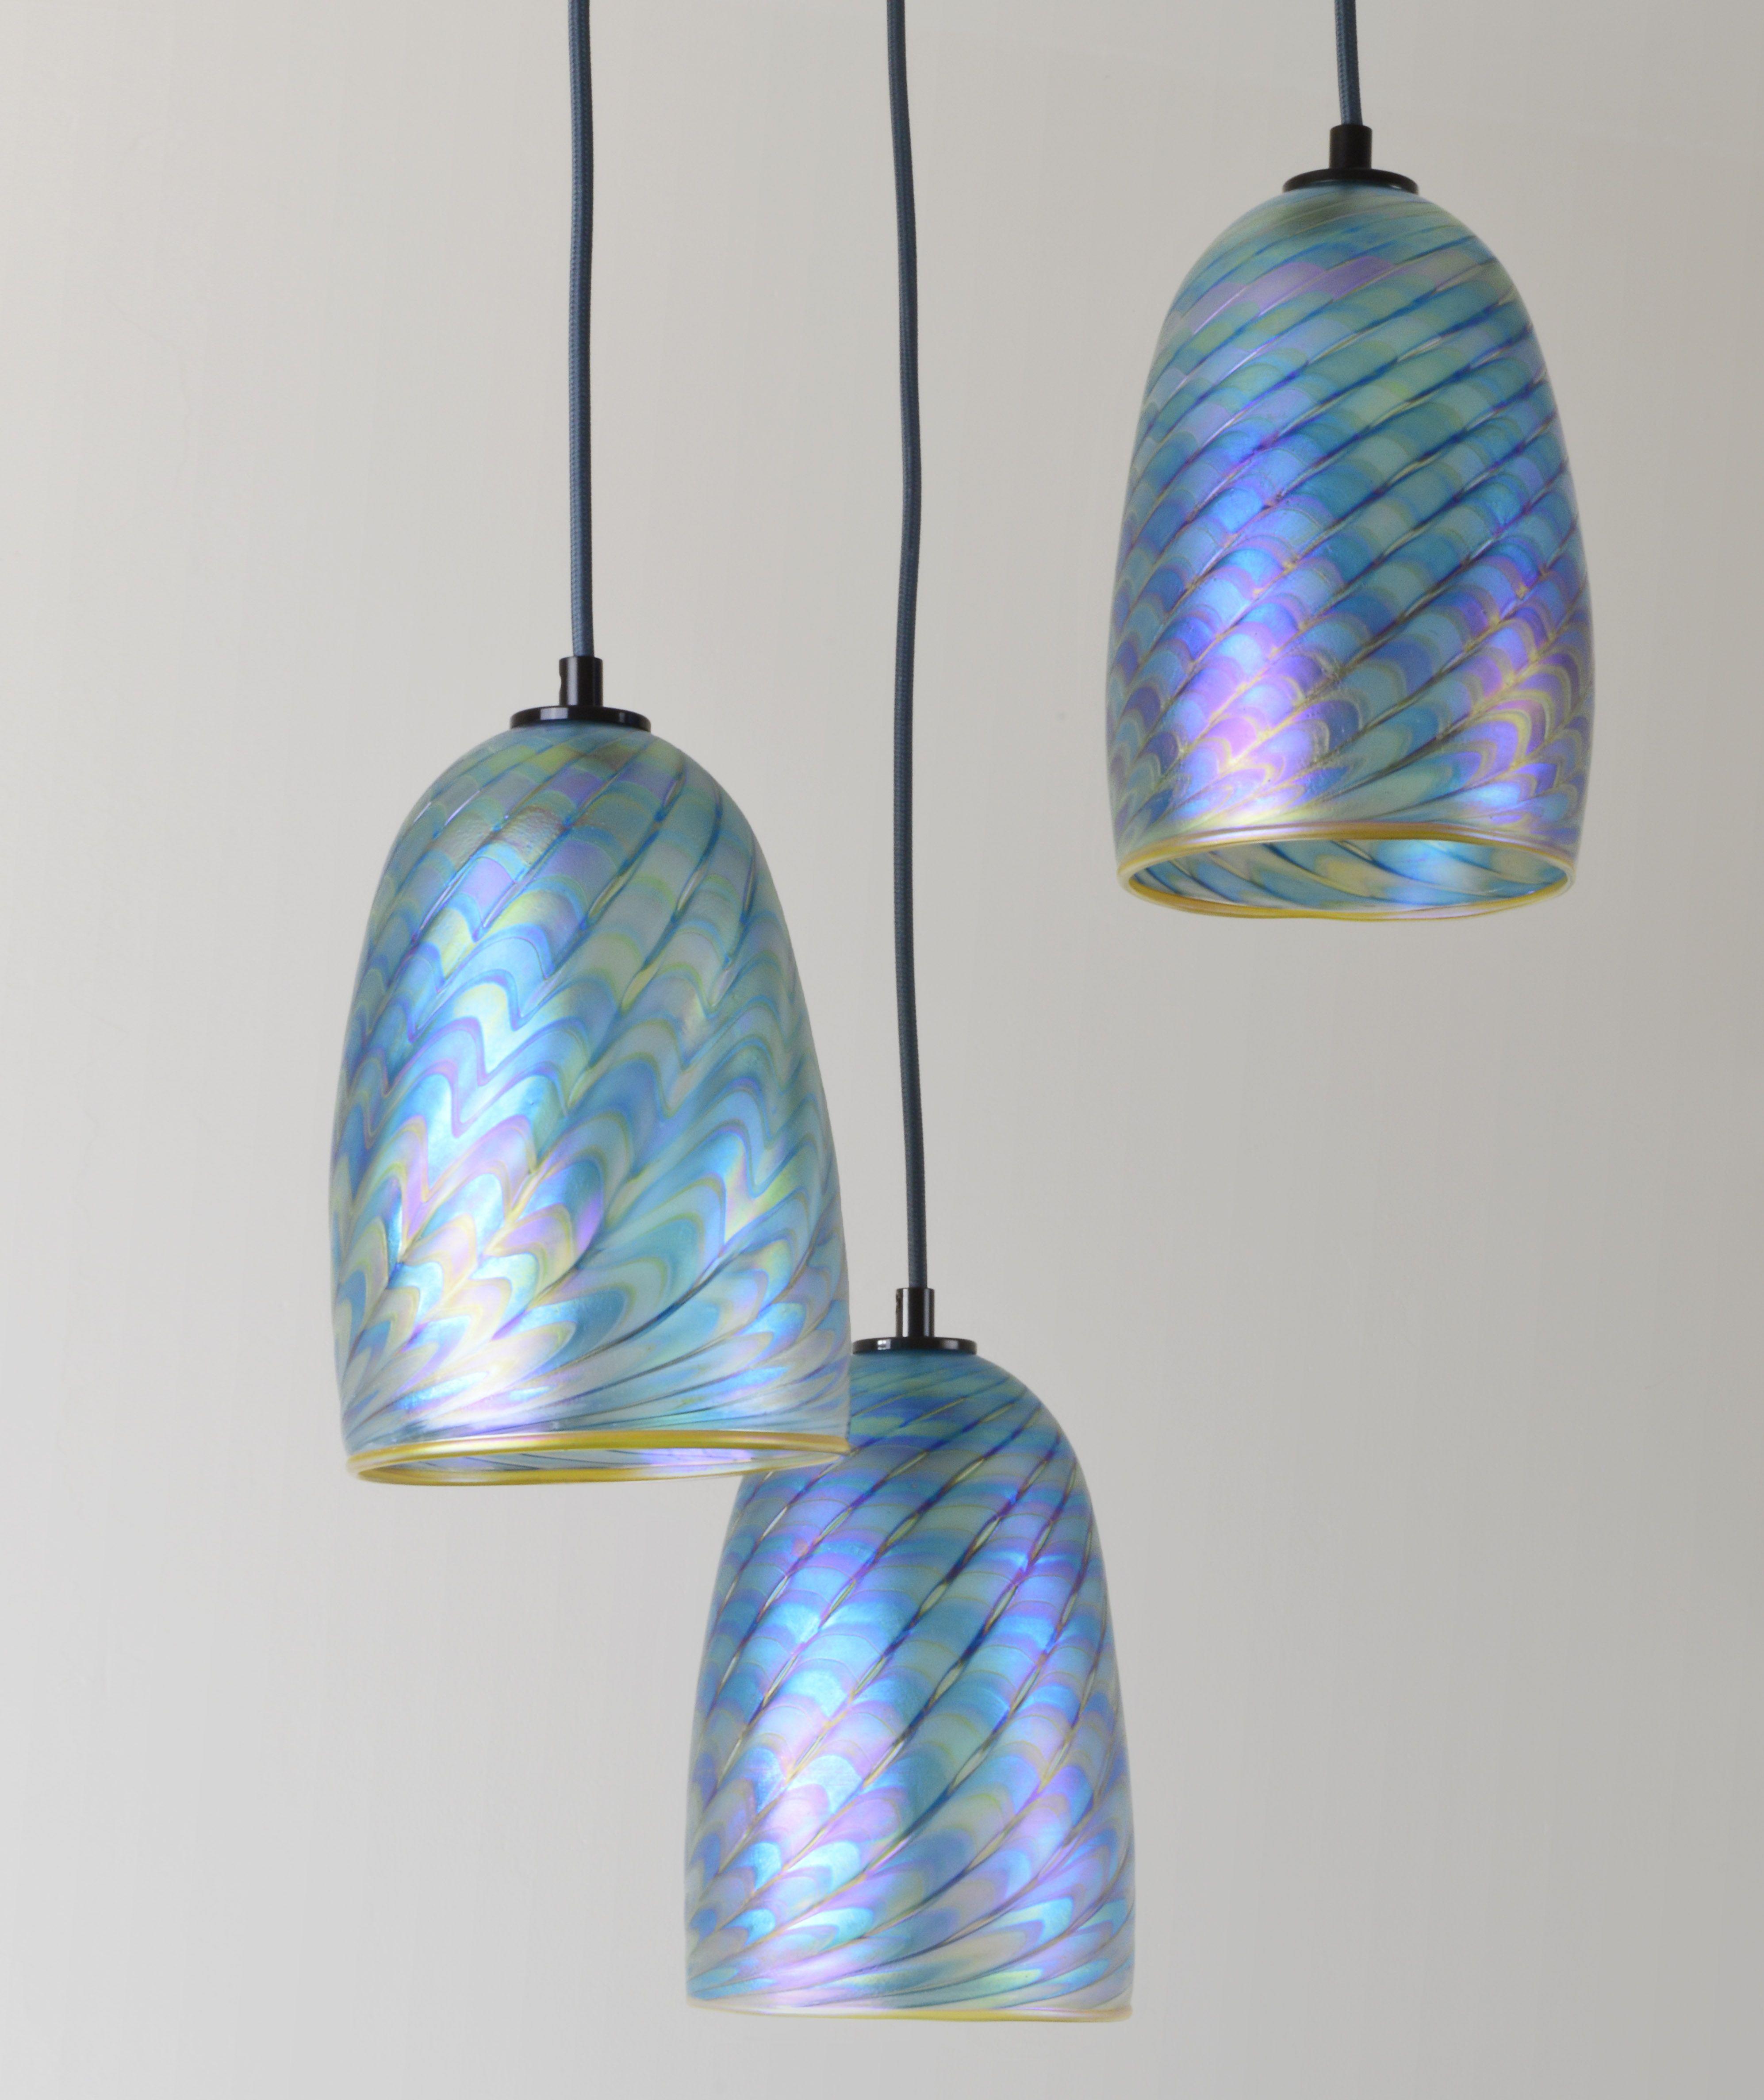 Art Glass Pendant Lighitng Iridescent Glass Hanging Lamp By Iricape Glass Ceiling Pendant Glass Pendant Light Glass Pendant Ceiling Light Mini pendant lights art glass